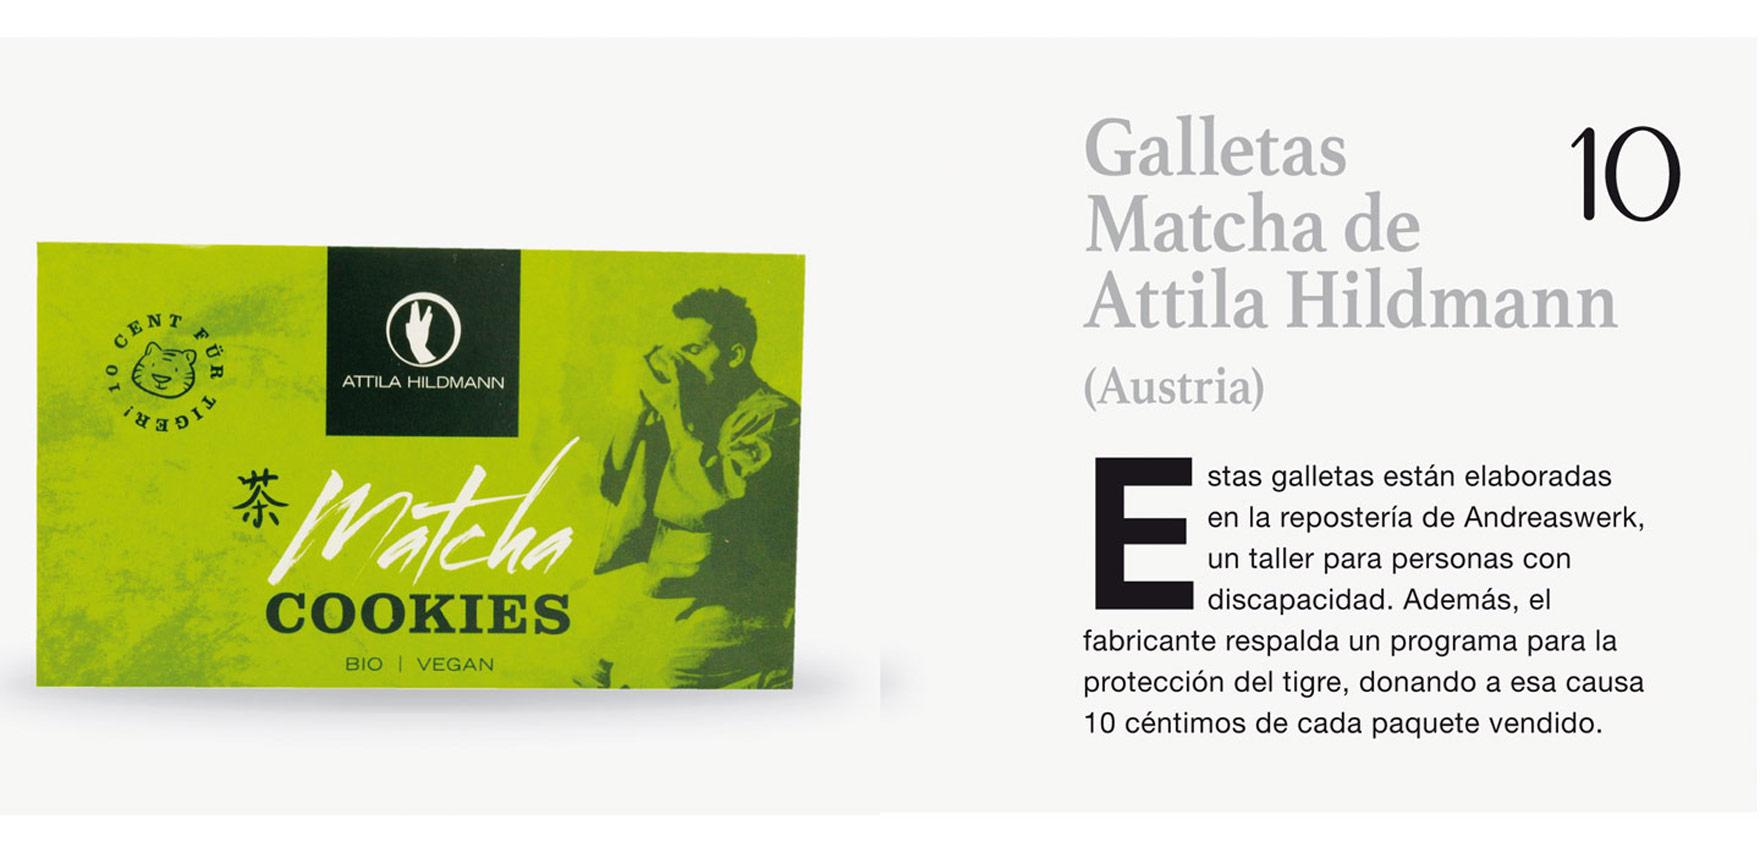 Galletas Matcha de Attila Hildmann